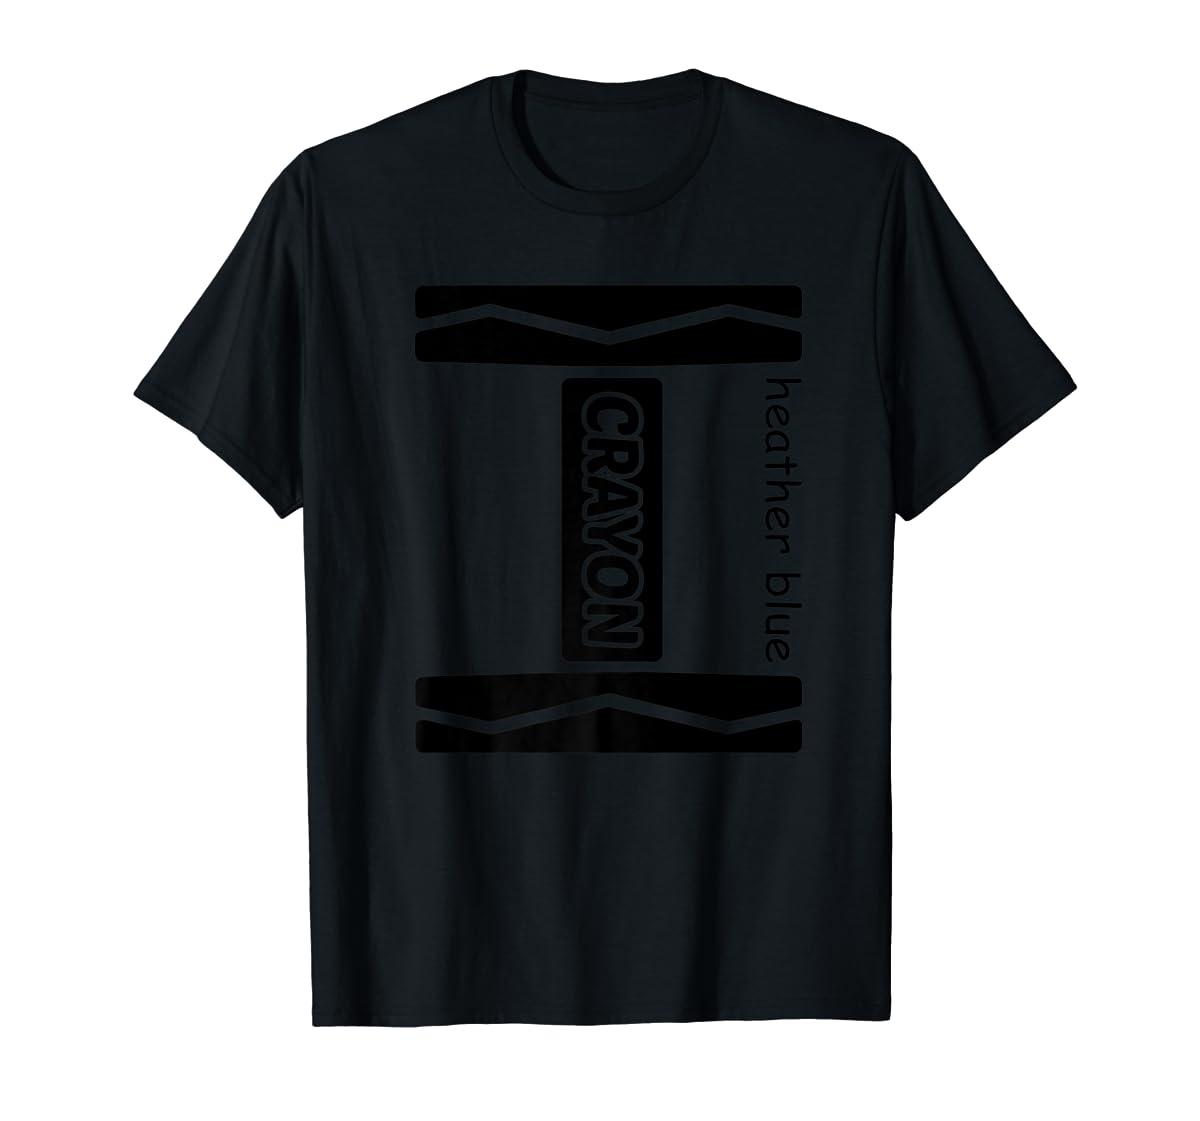 Heather Blue Crayon Halloween Costume Couple Friend Group Premium T-Shirt-Men's T-Shirt-Black